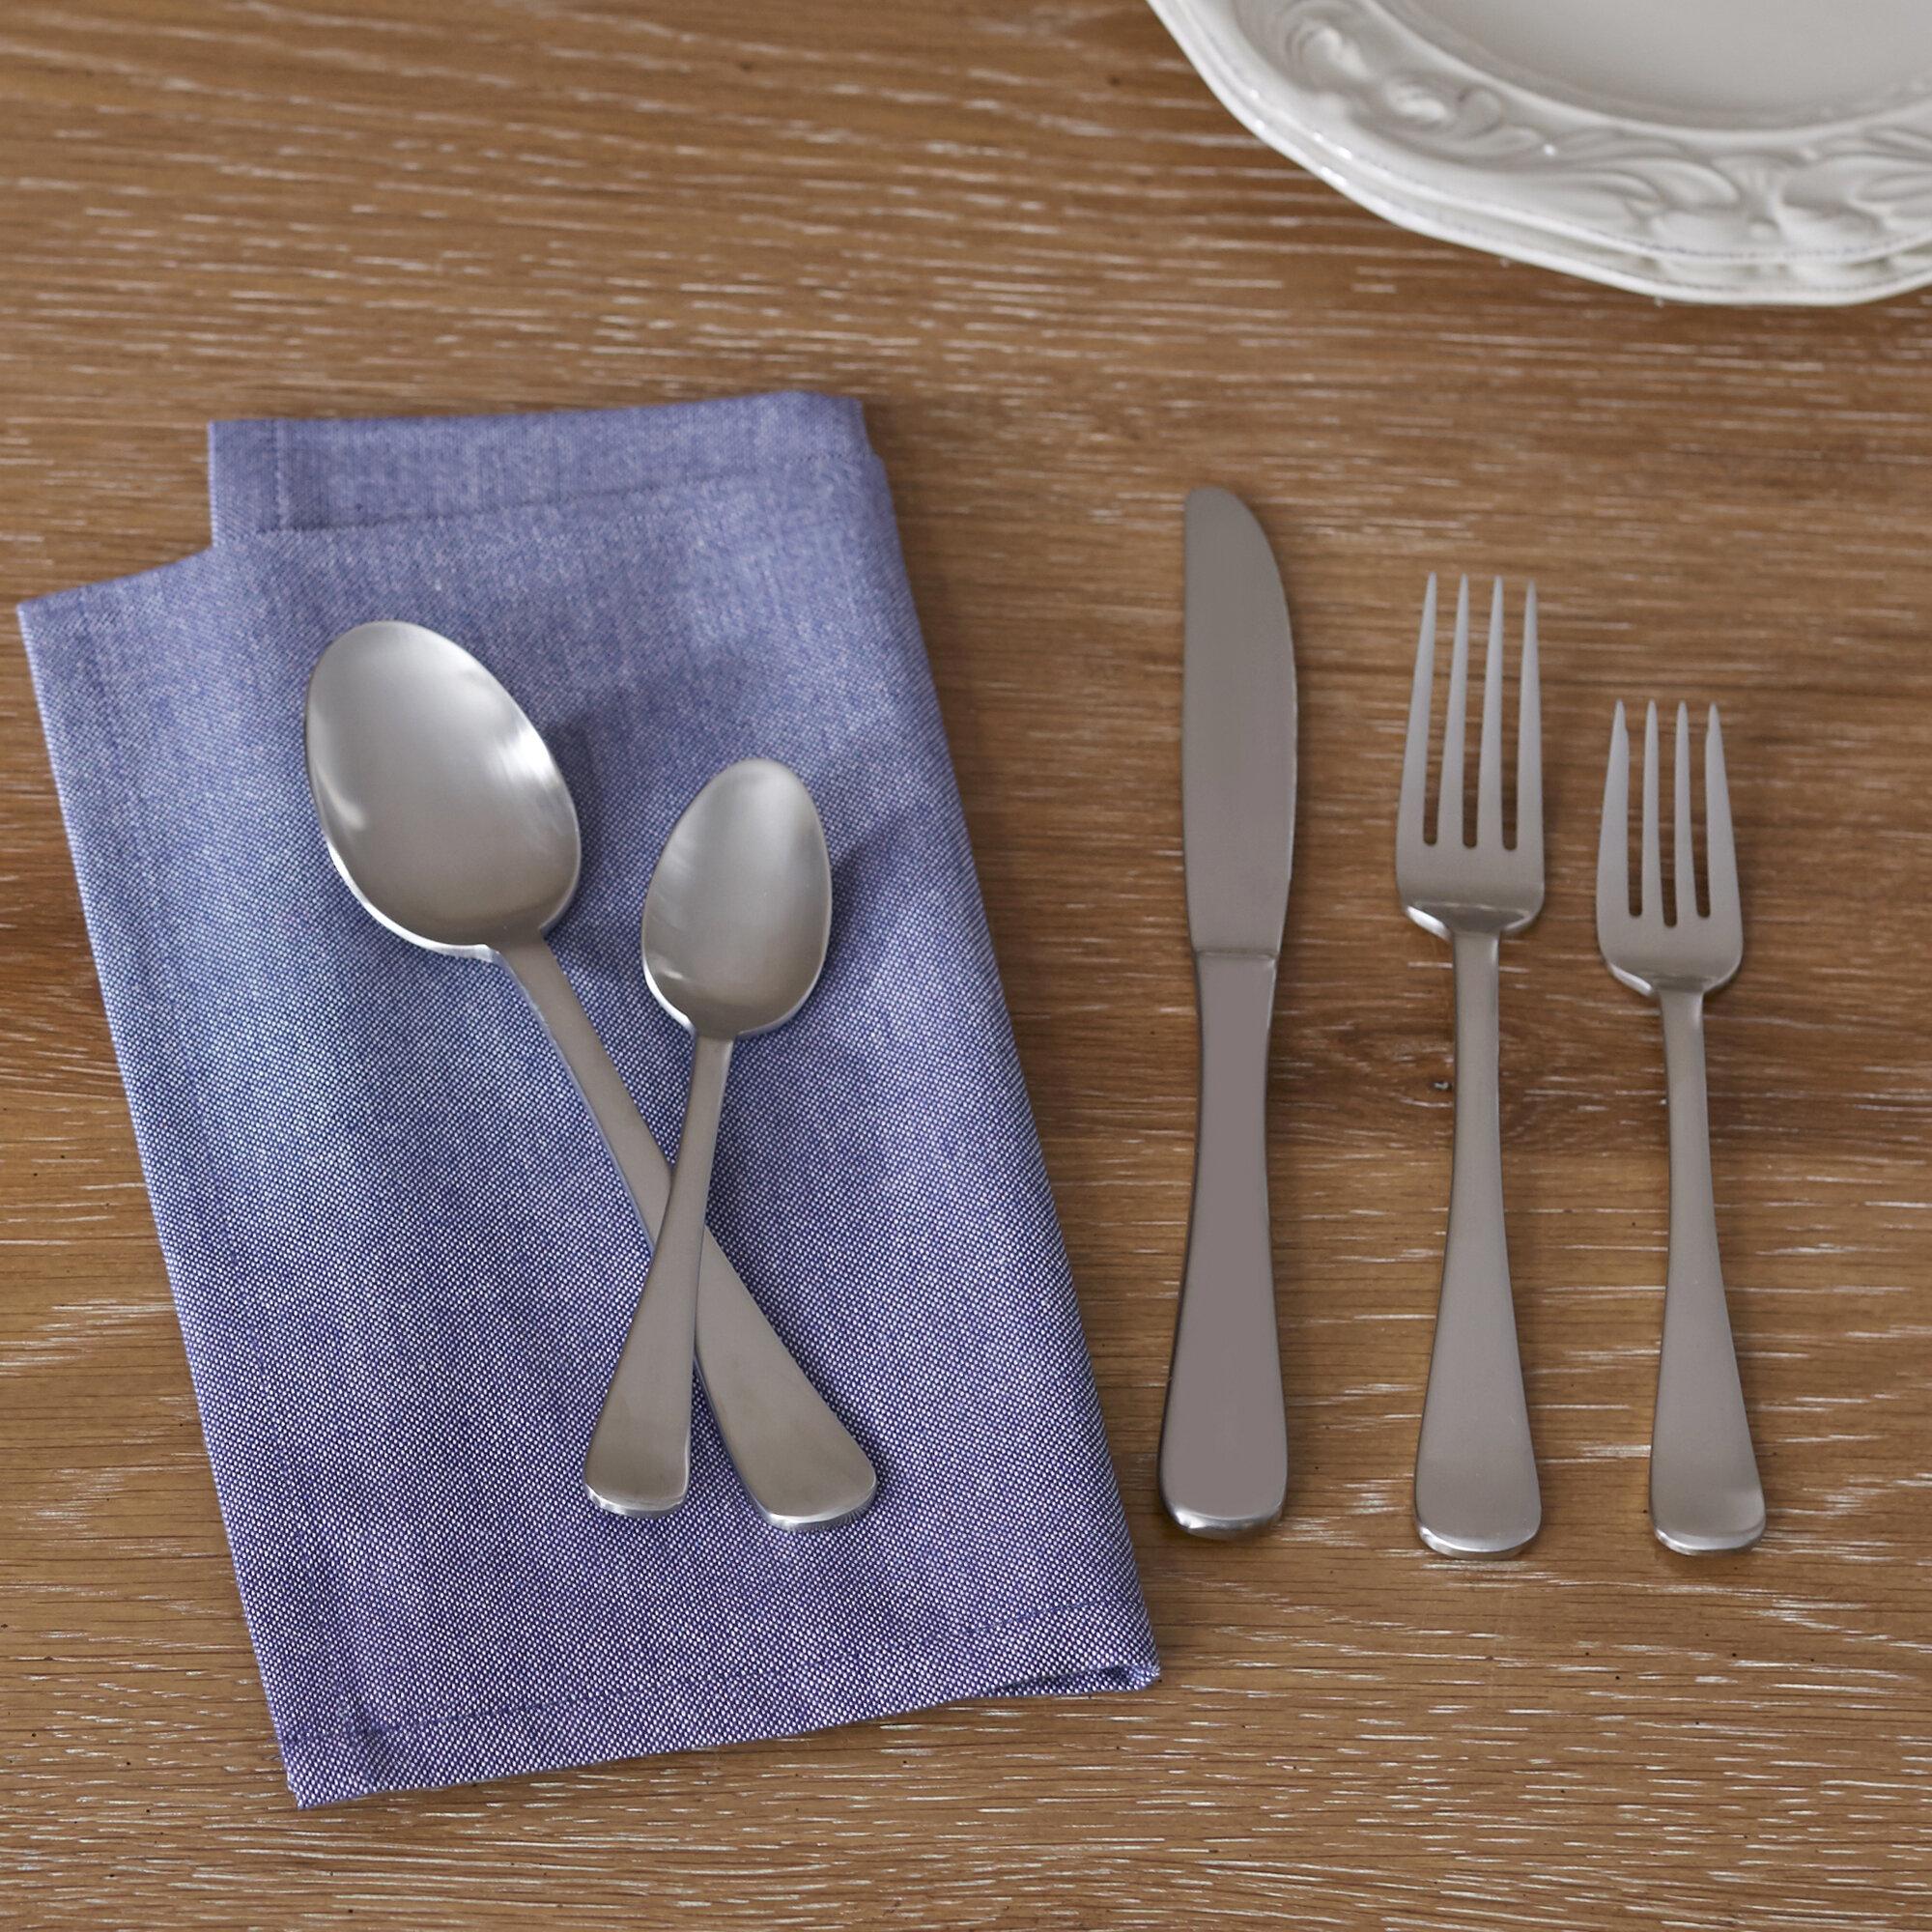 Charlton Home Adalynn 20 Piece 18 10 Stainless Steel Flatware Set Service For 4 Reviews Wayfair